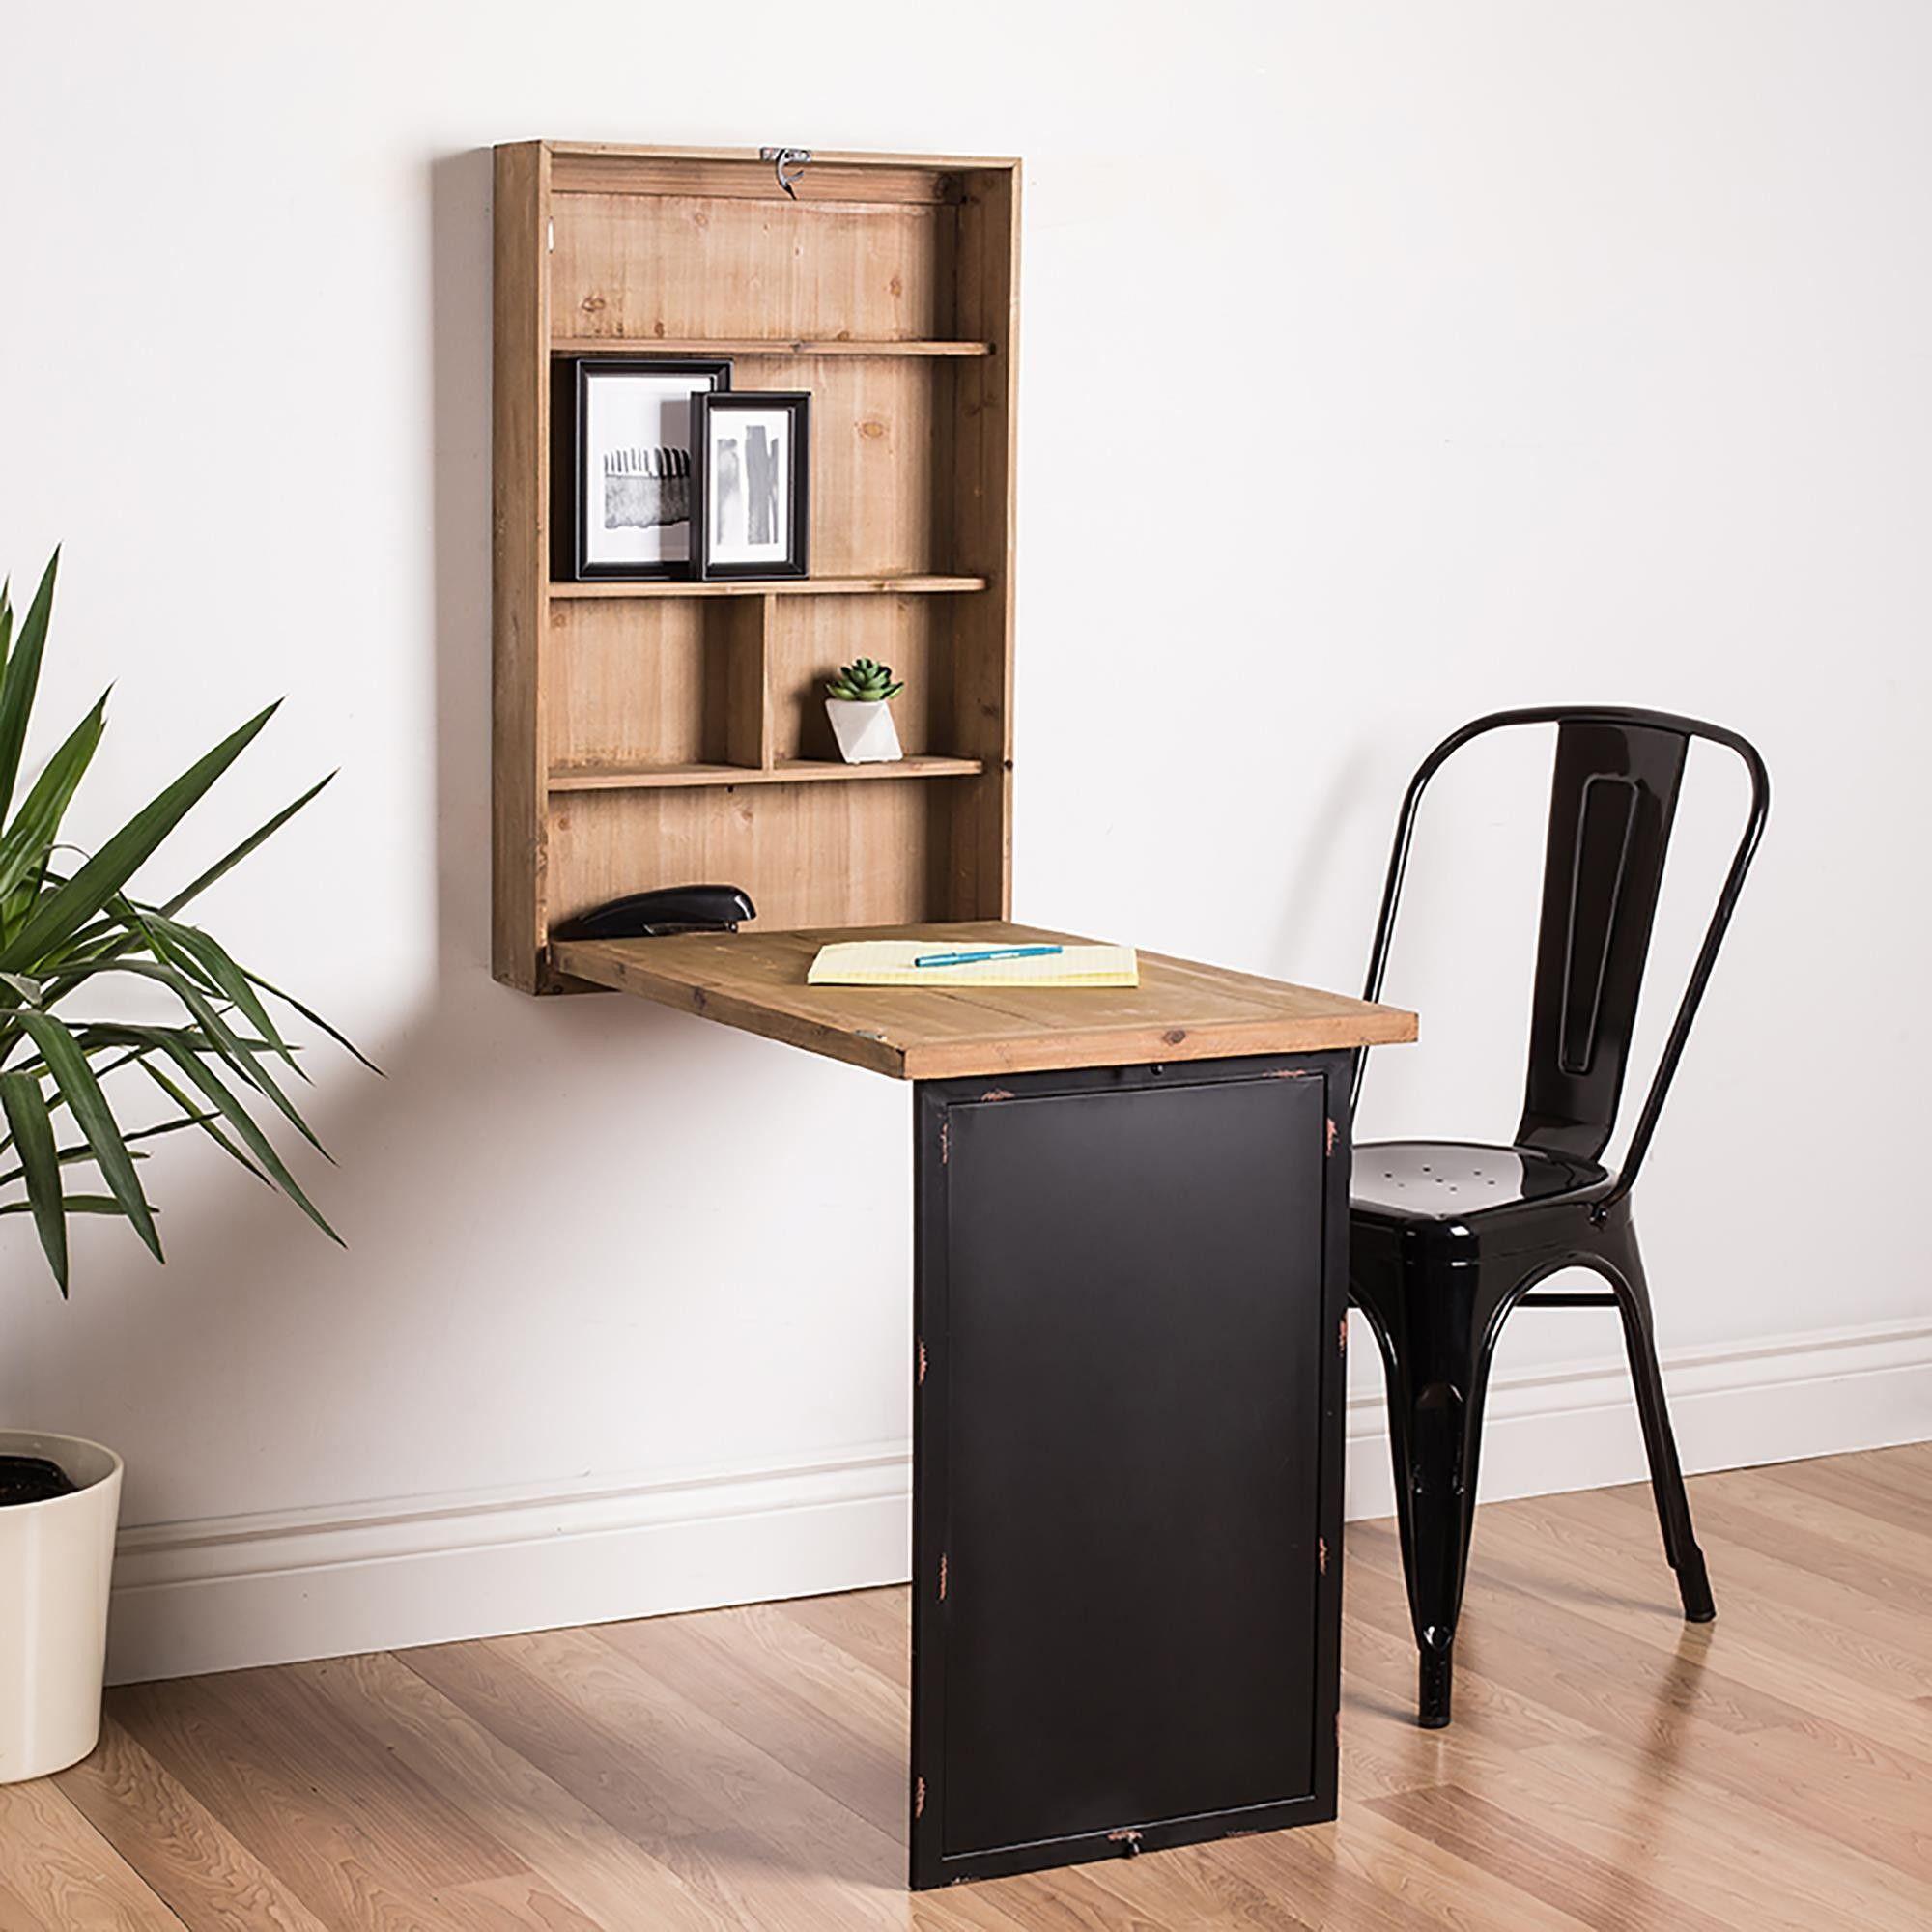 Genial Home Essentials Rustic Home Fold Away Desk (Wood Grain)